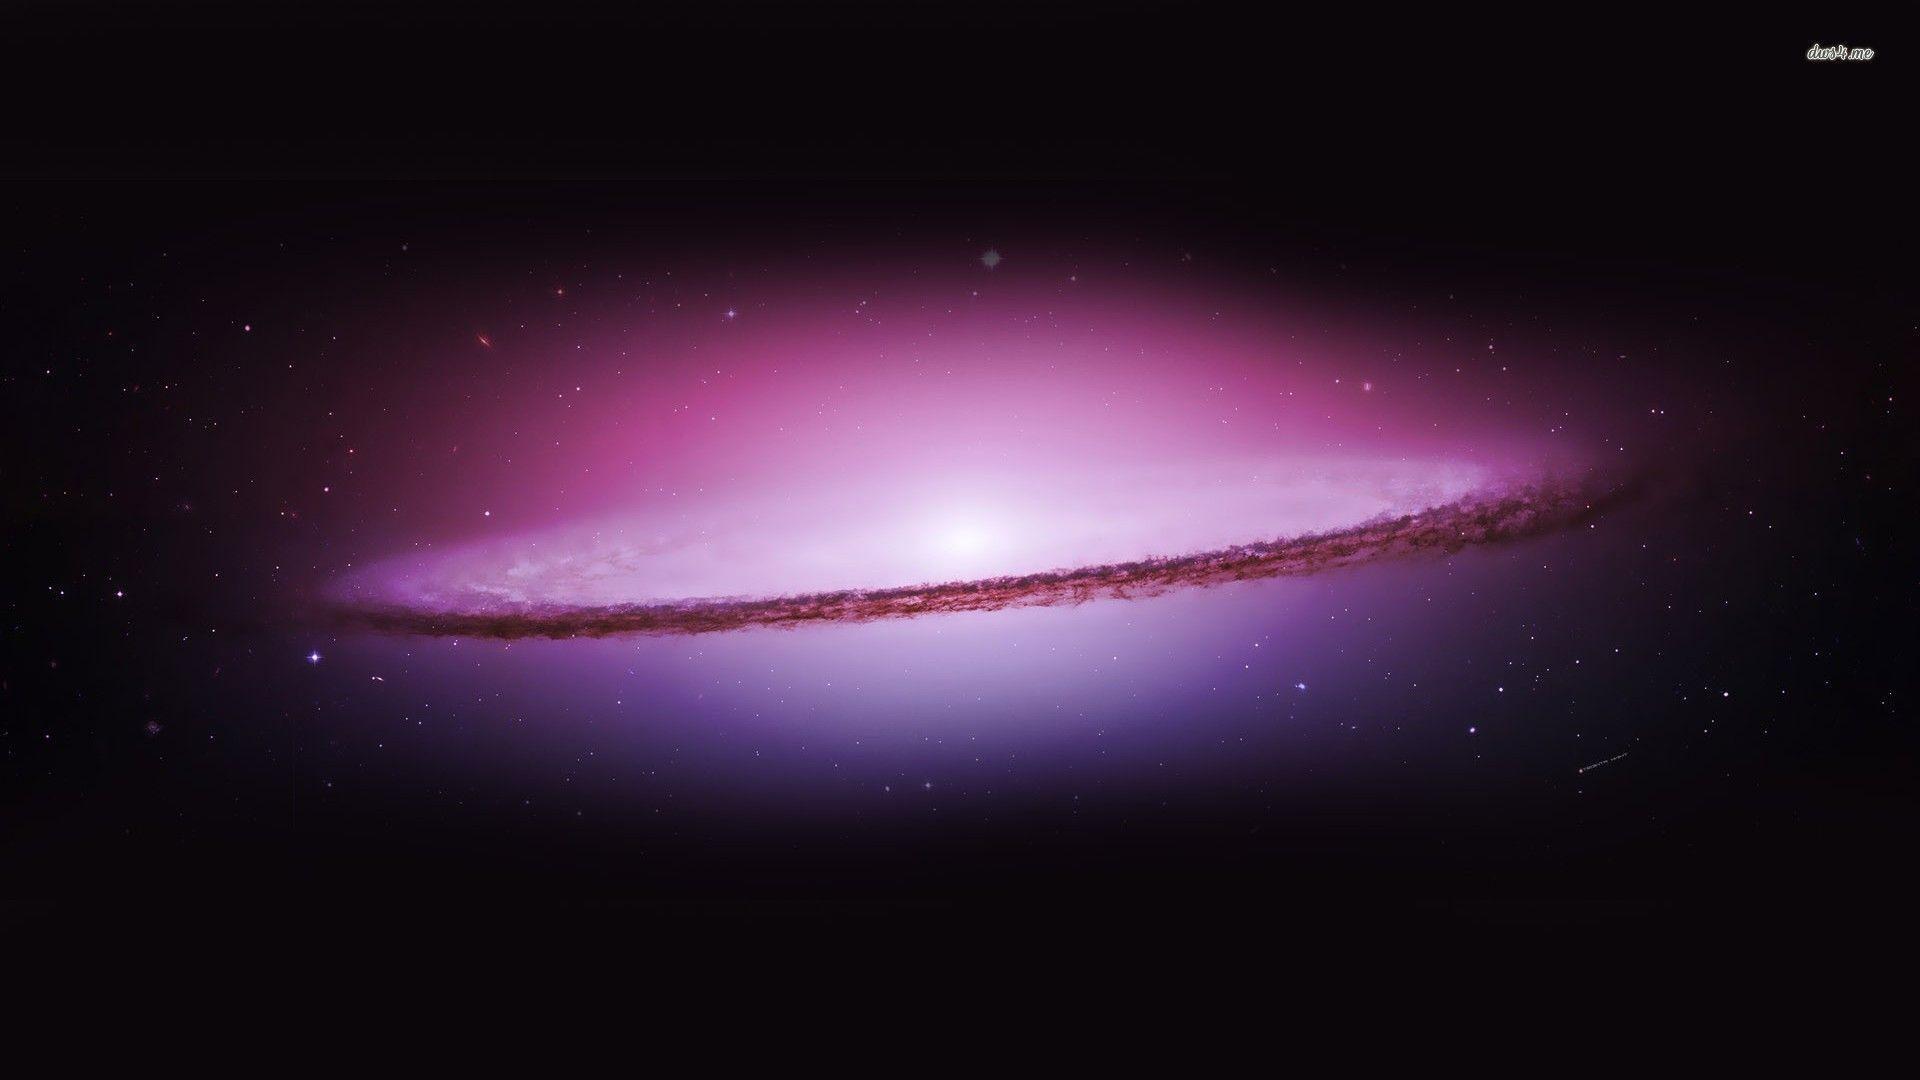 Imac Wallpaper 1080p